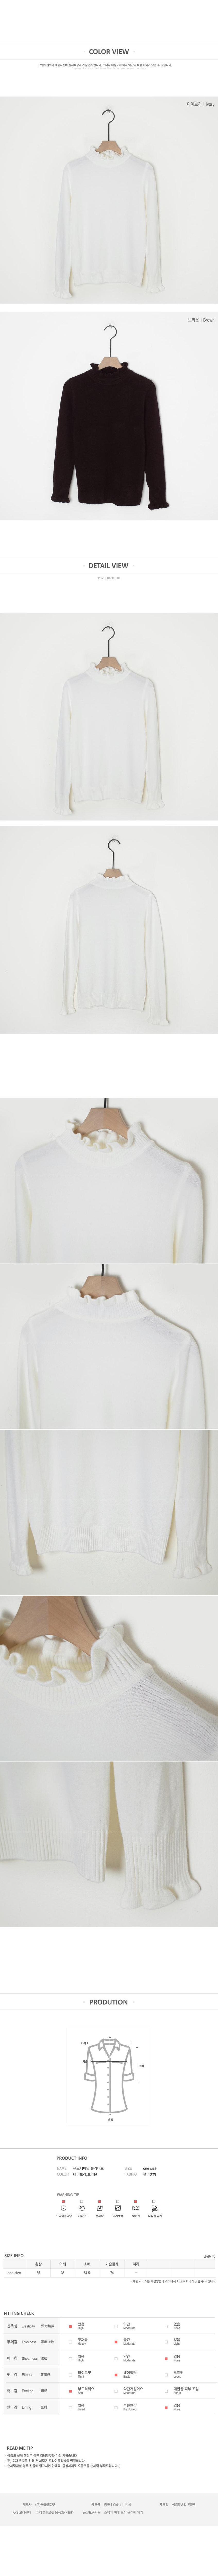 Mood Feminine Polar Knit